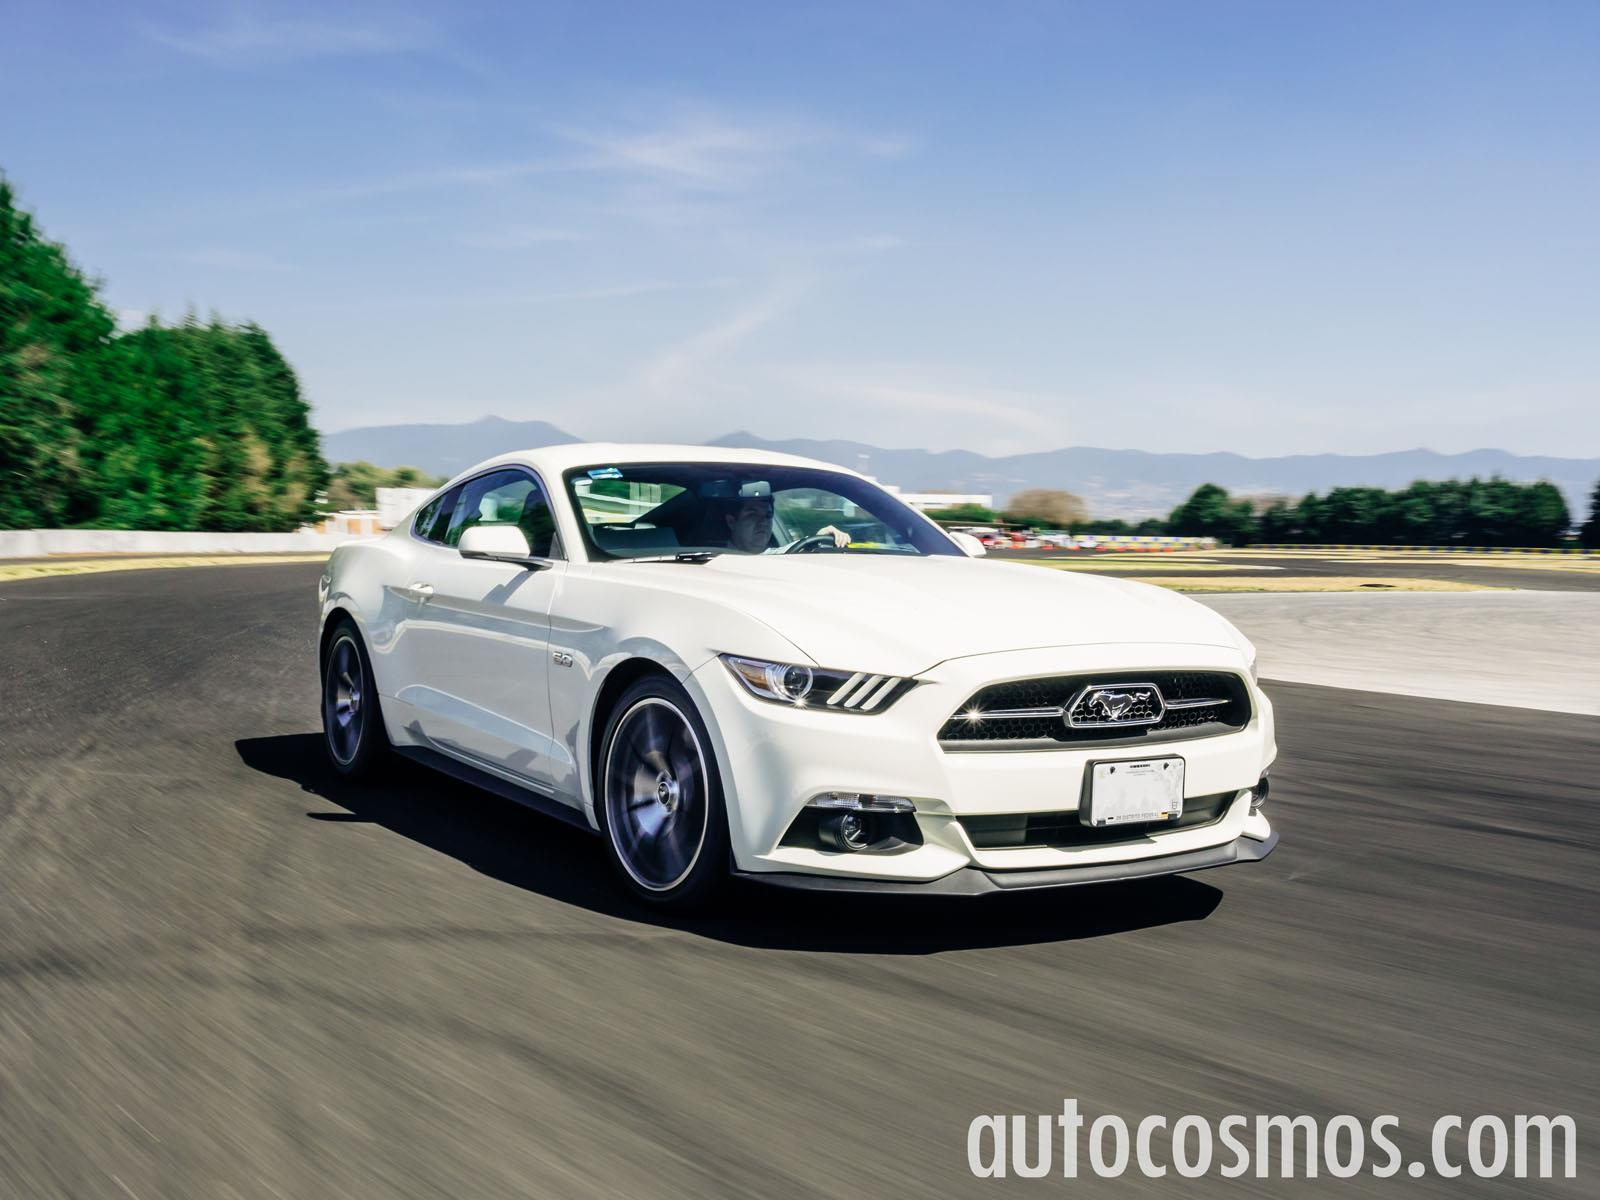 Ford Mustang 2015 Blanco Galería Ford Mustang 2015 50